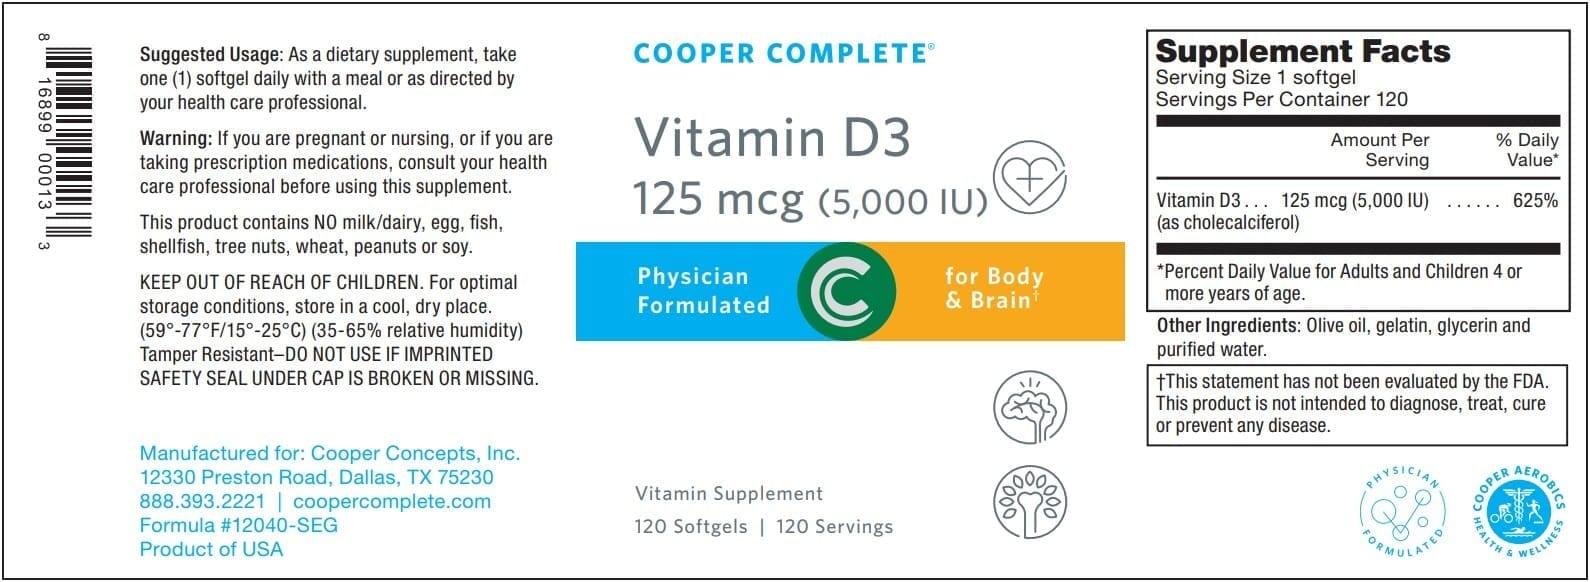 Vitamin D3 125 mcg Label From Cooper Complete